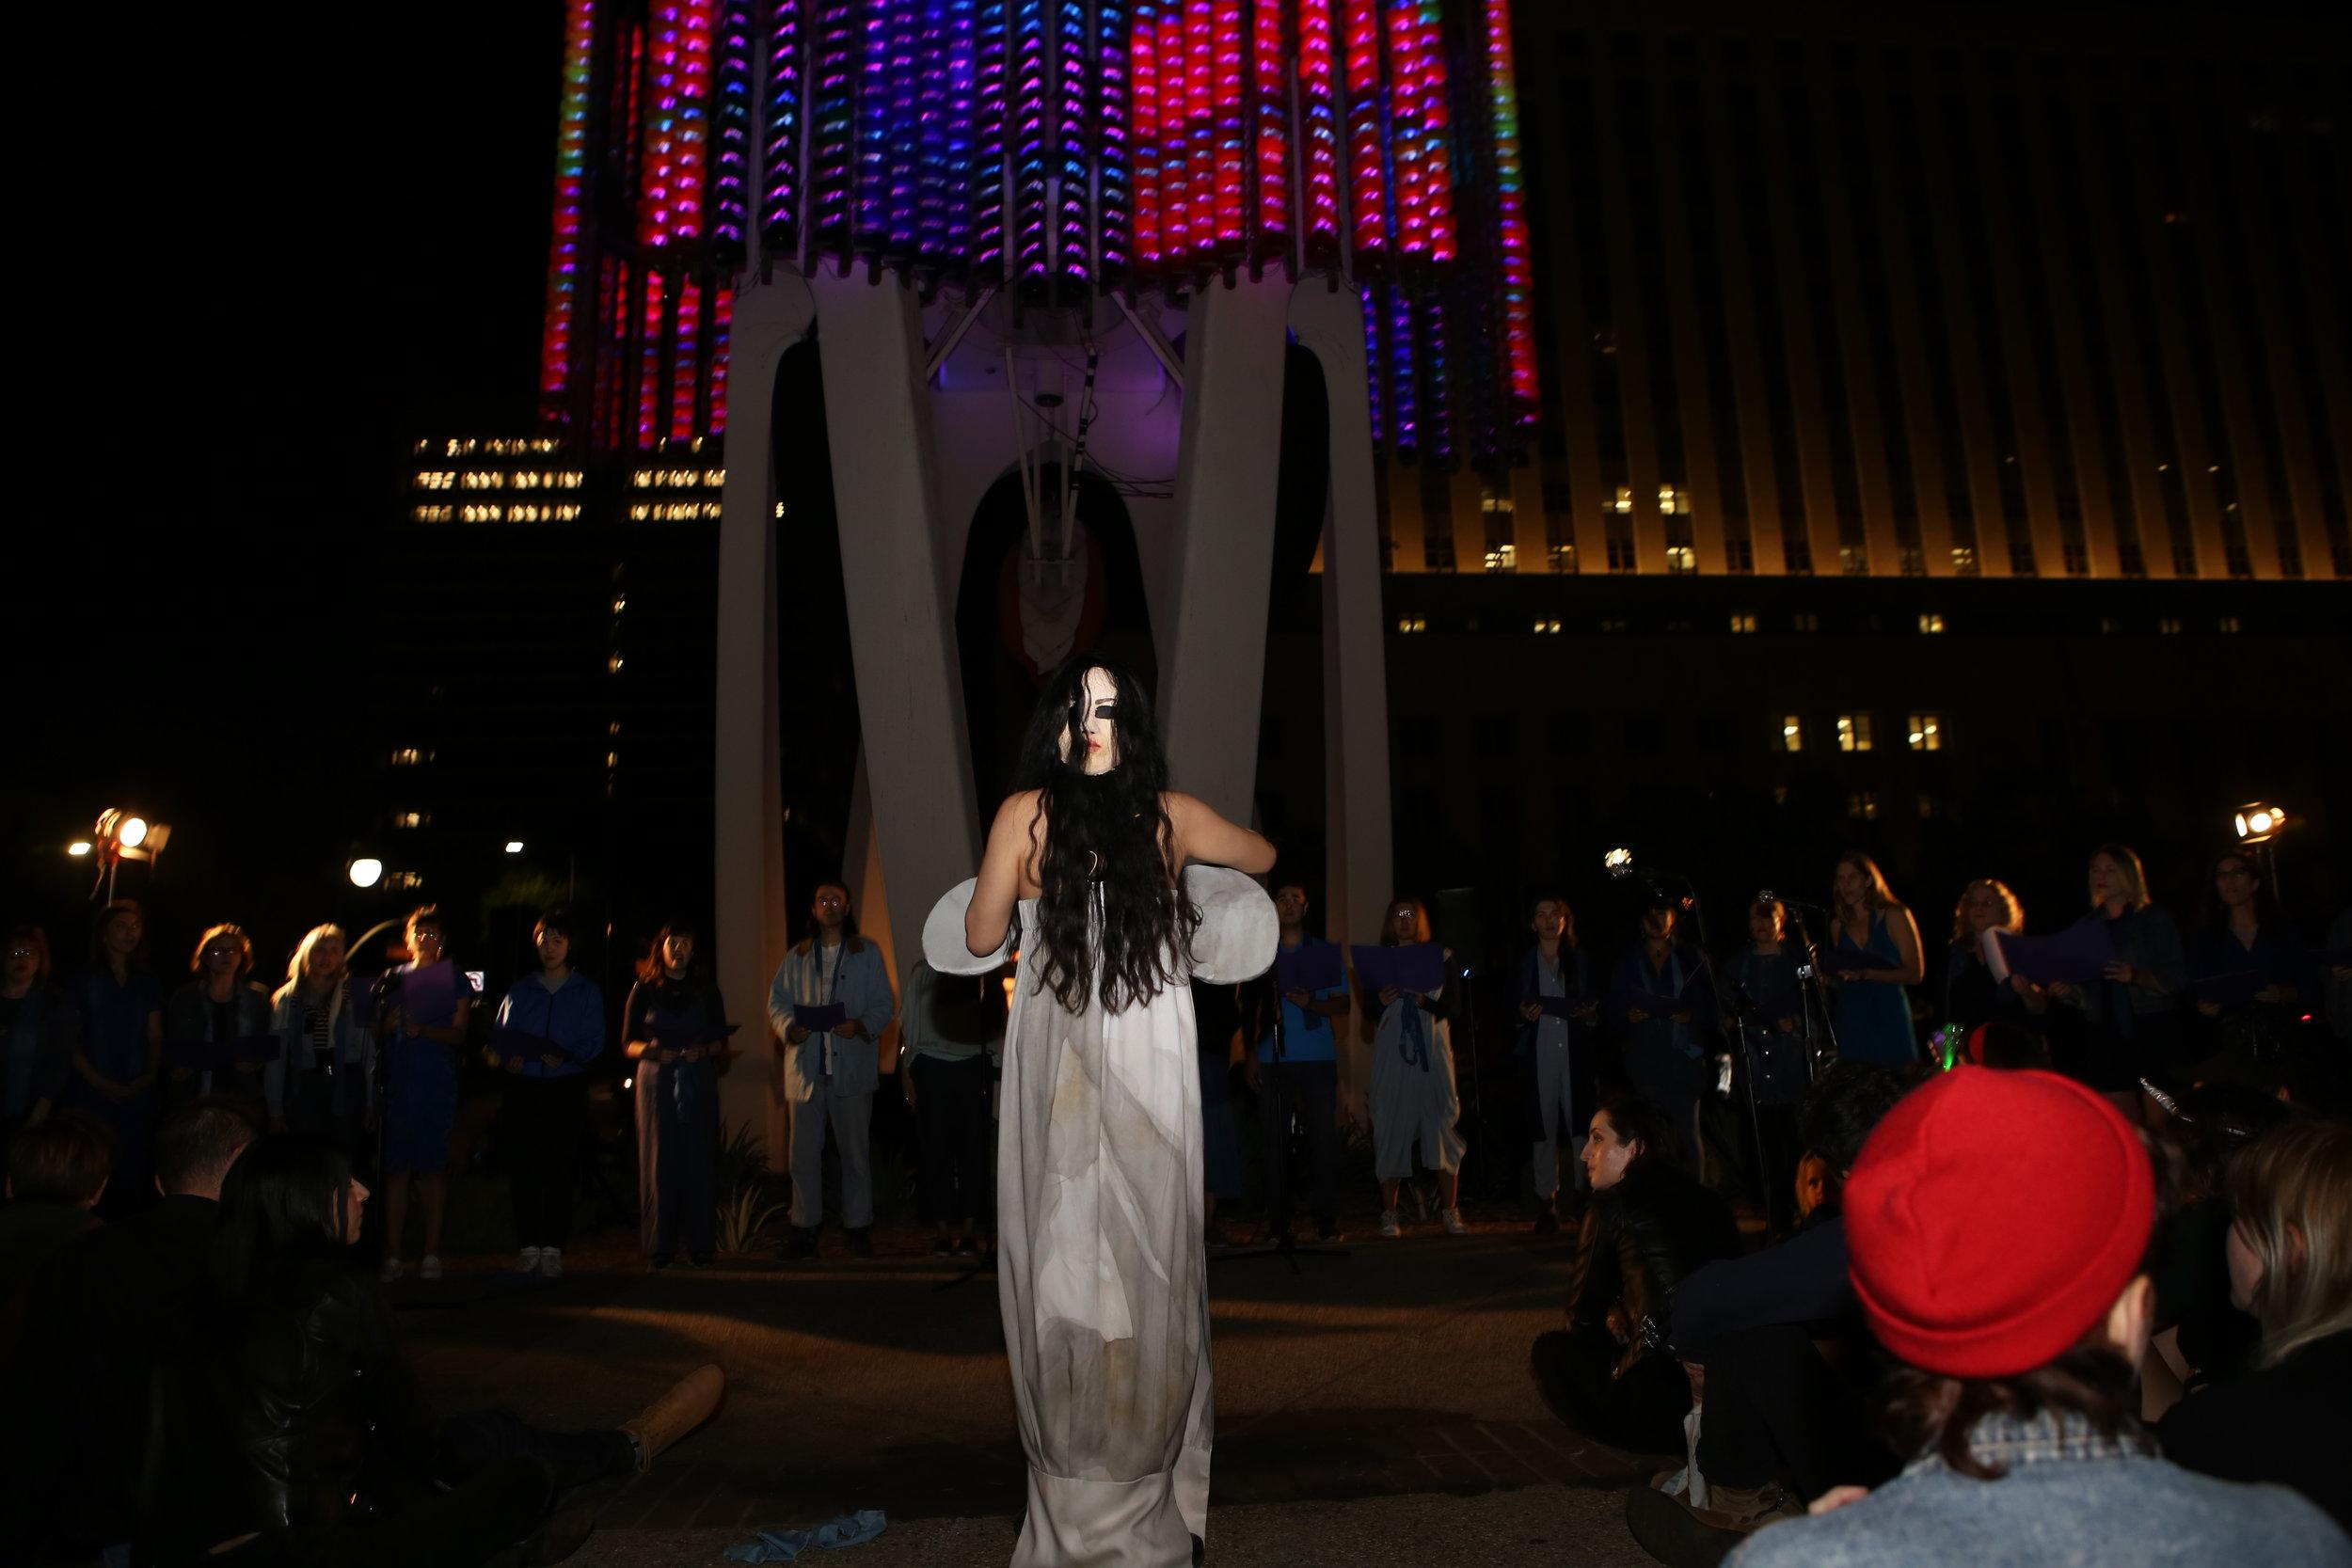 Ritual 4 Democracy at Triforium: Tany Ling conducting Community Chorus. Photo: Steven Andrew Garcia